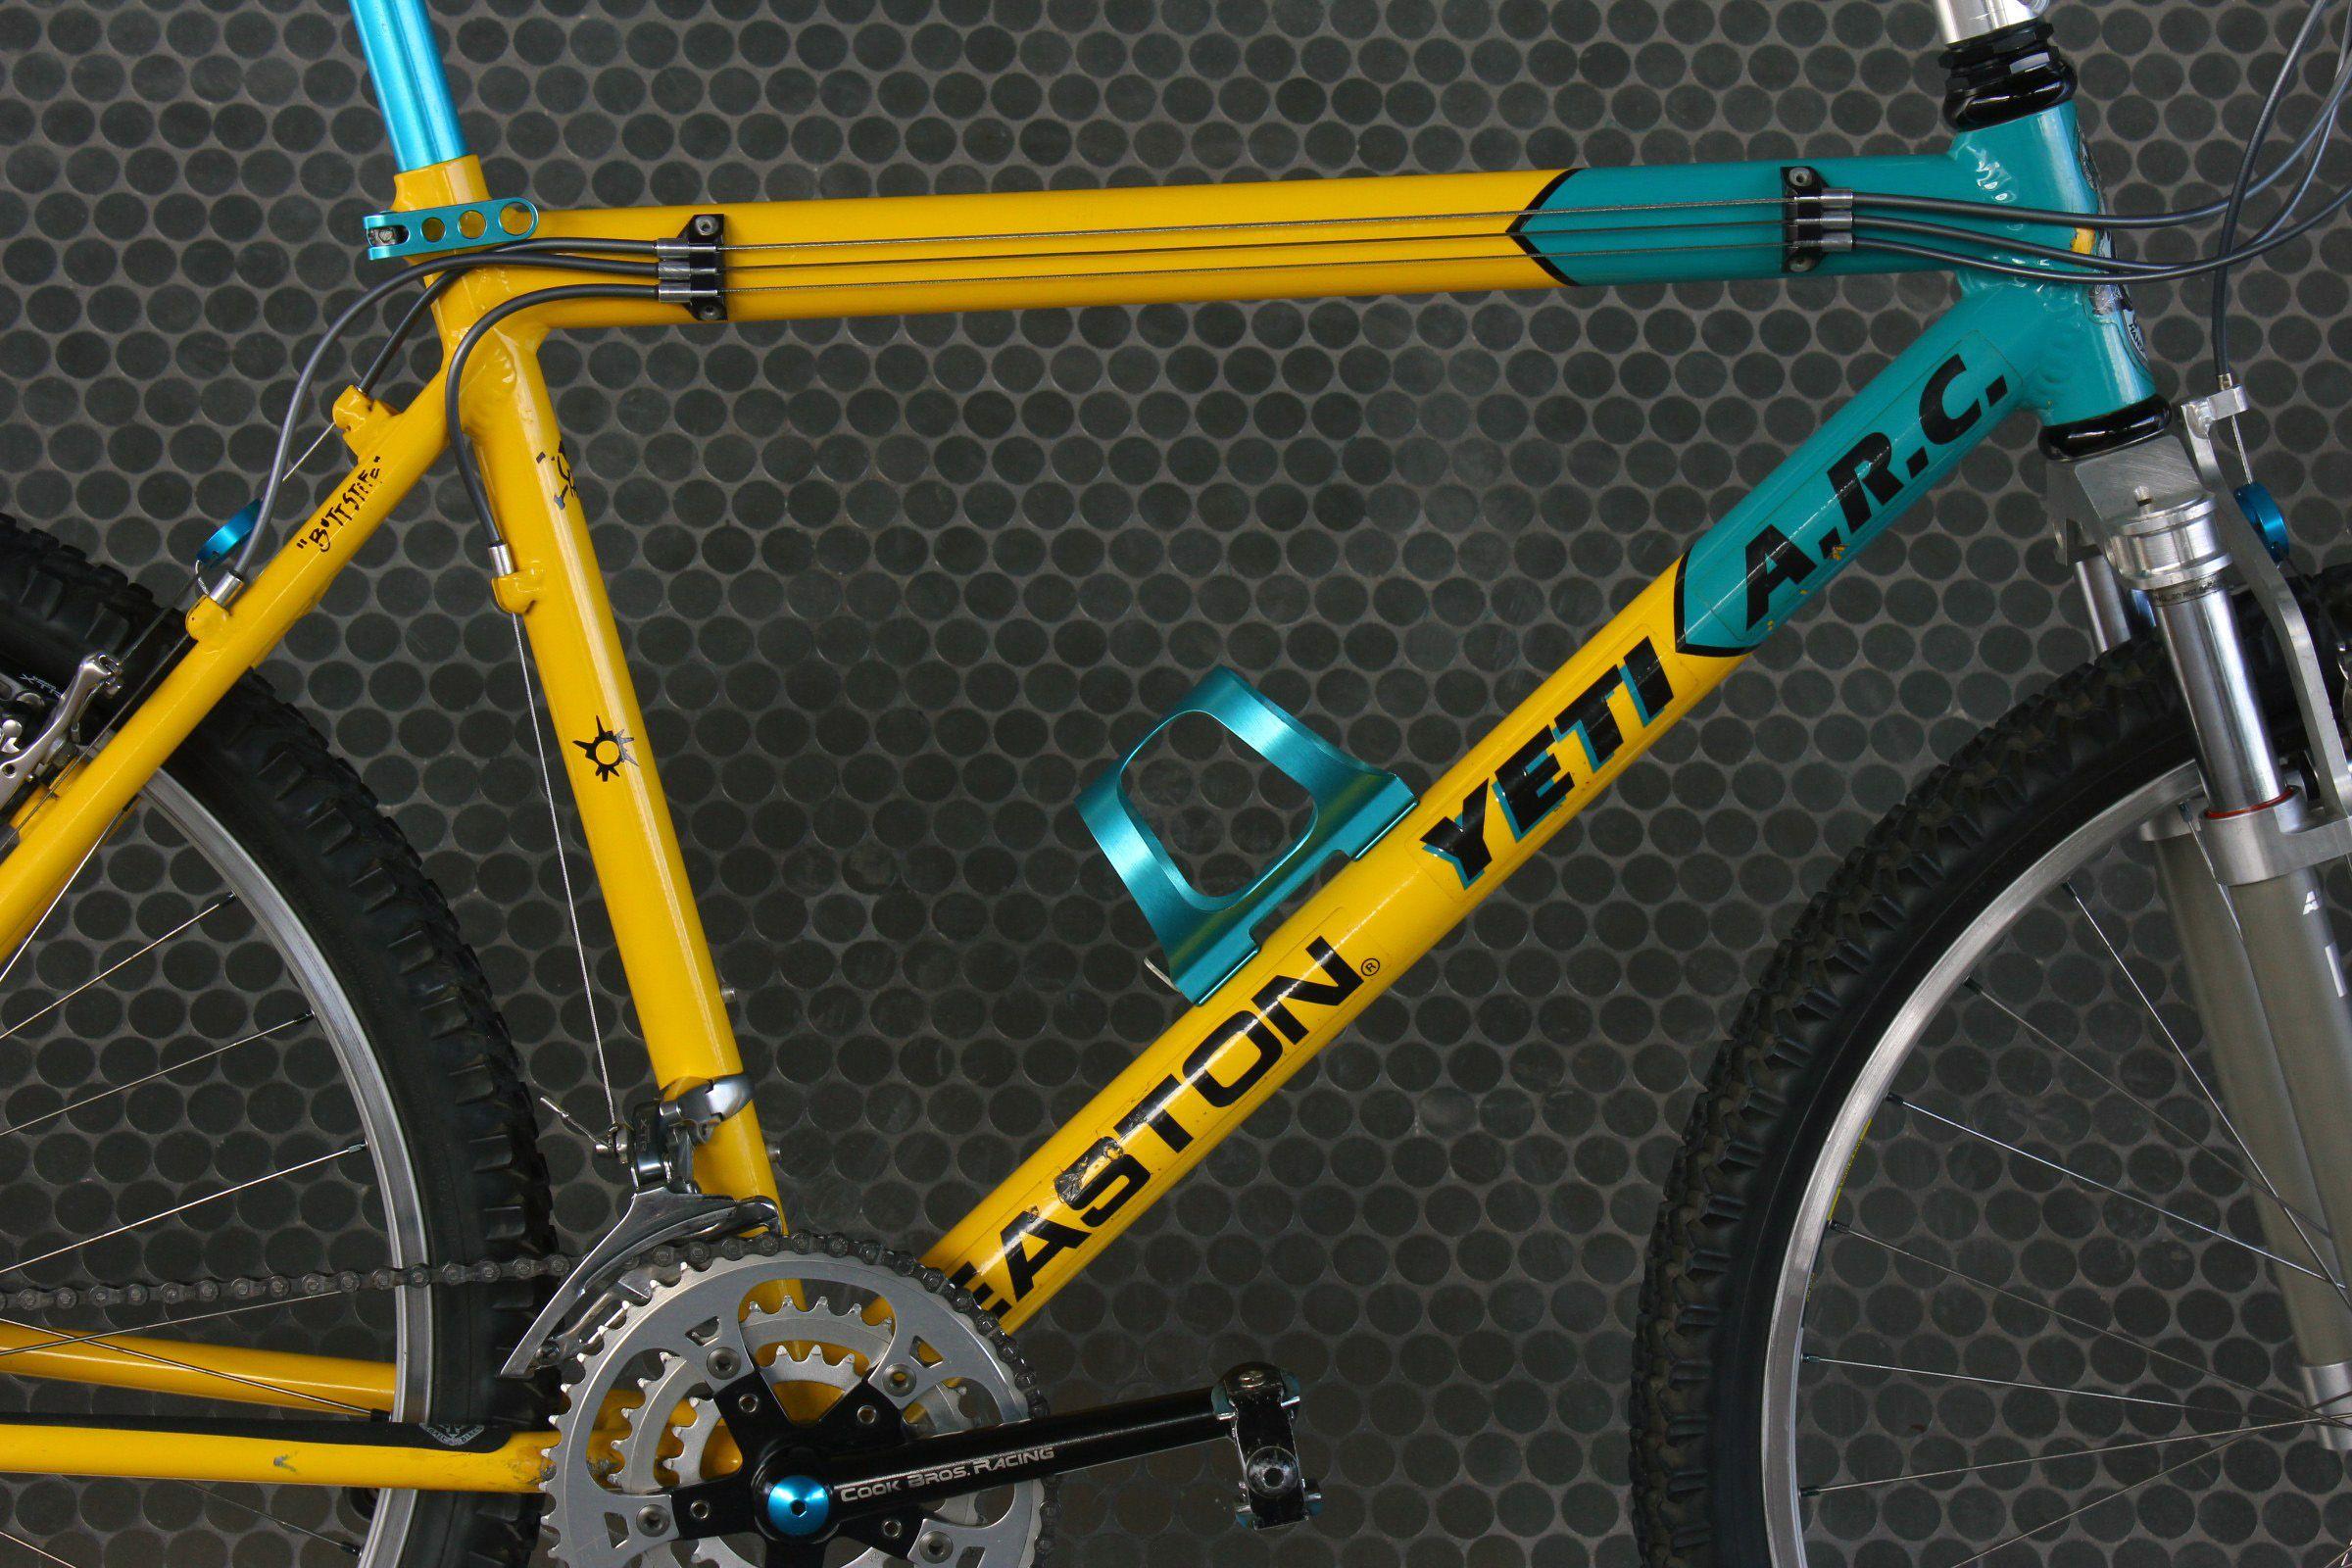 Teaser 1992 Yeti A R C Bike Recyclery Yeti Arc Vintage Mountain Bike Yeti